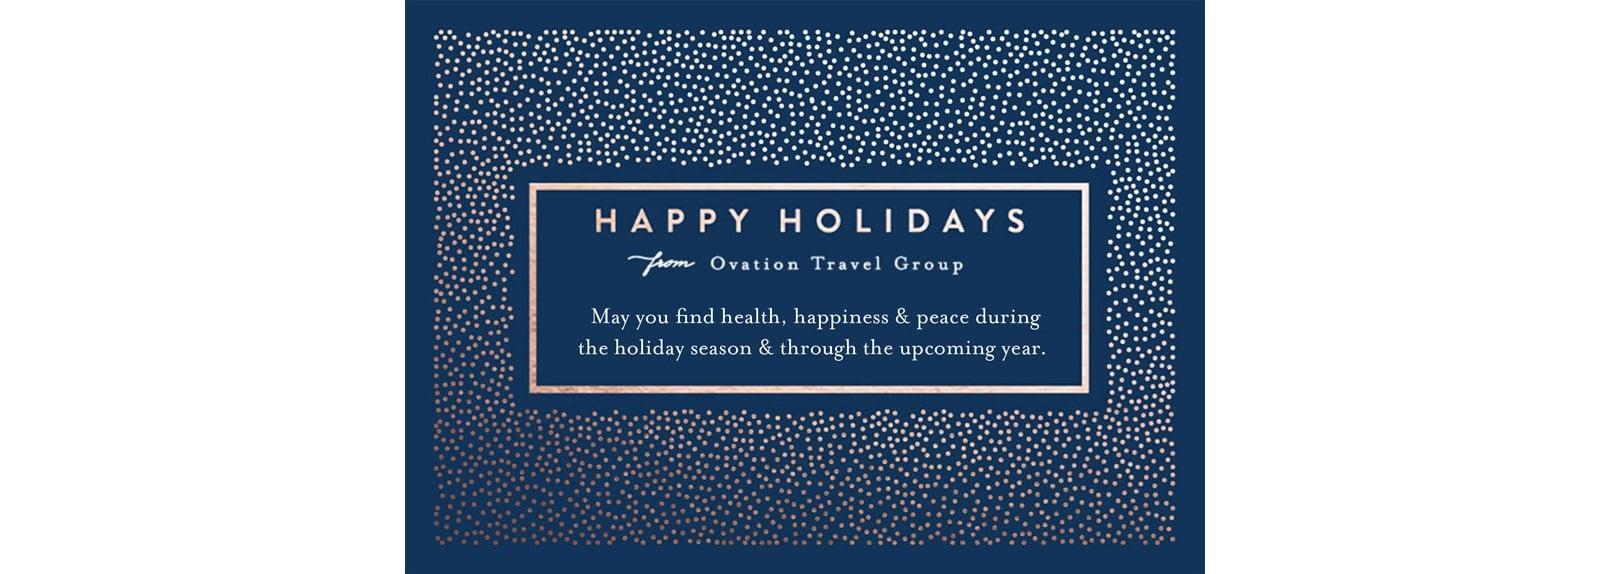 Ovation-Holiday-Card-Blog.jpg